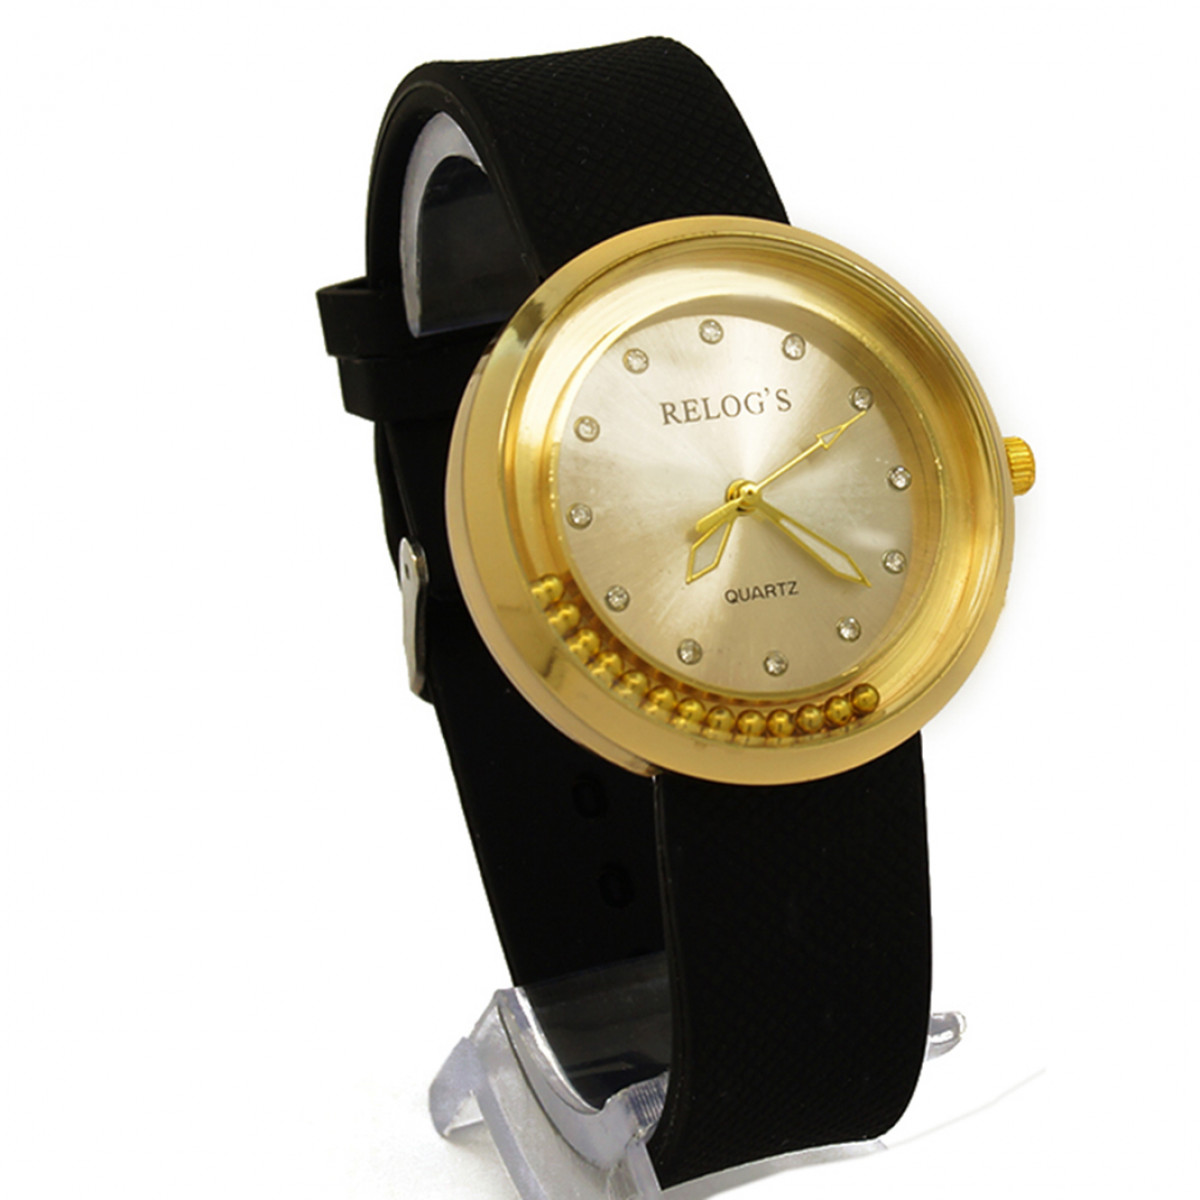 2c35188dd2c Relógio Feminino Golden   Co 43300 Analógico Relog s Preto - REL19101